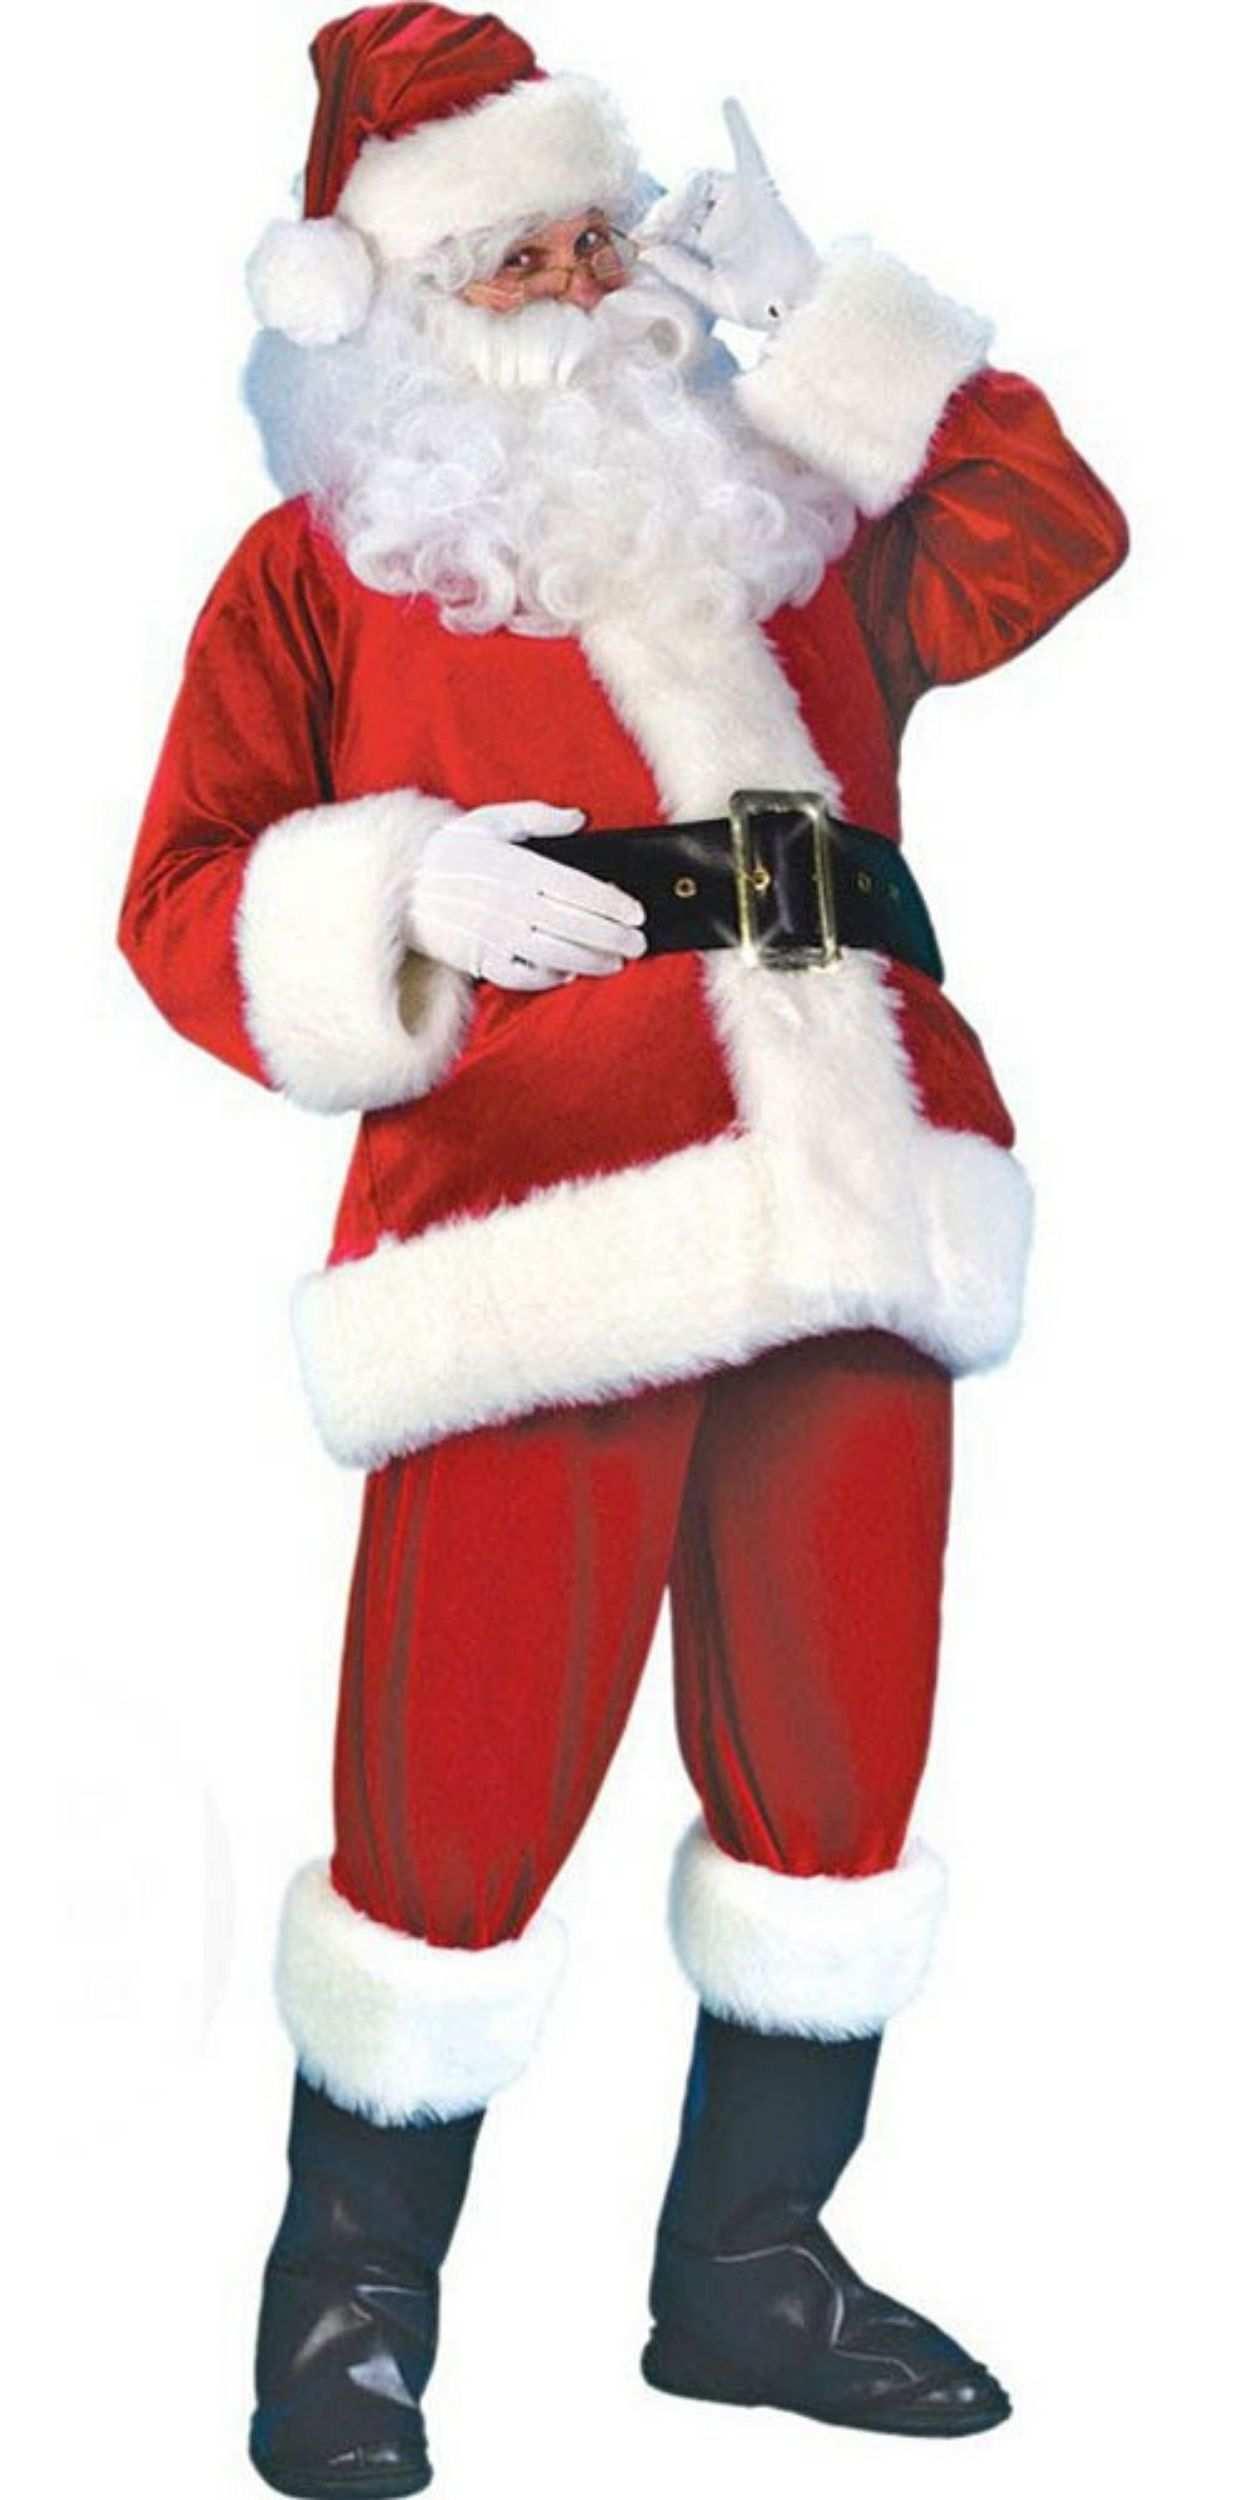 Man in Santa Party Costume